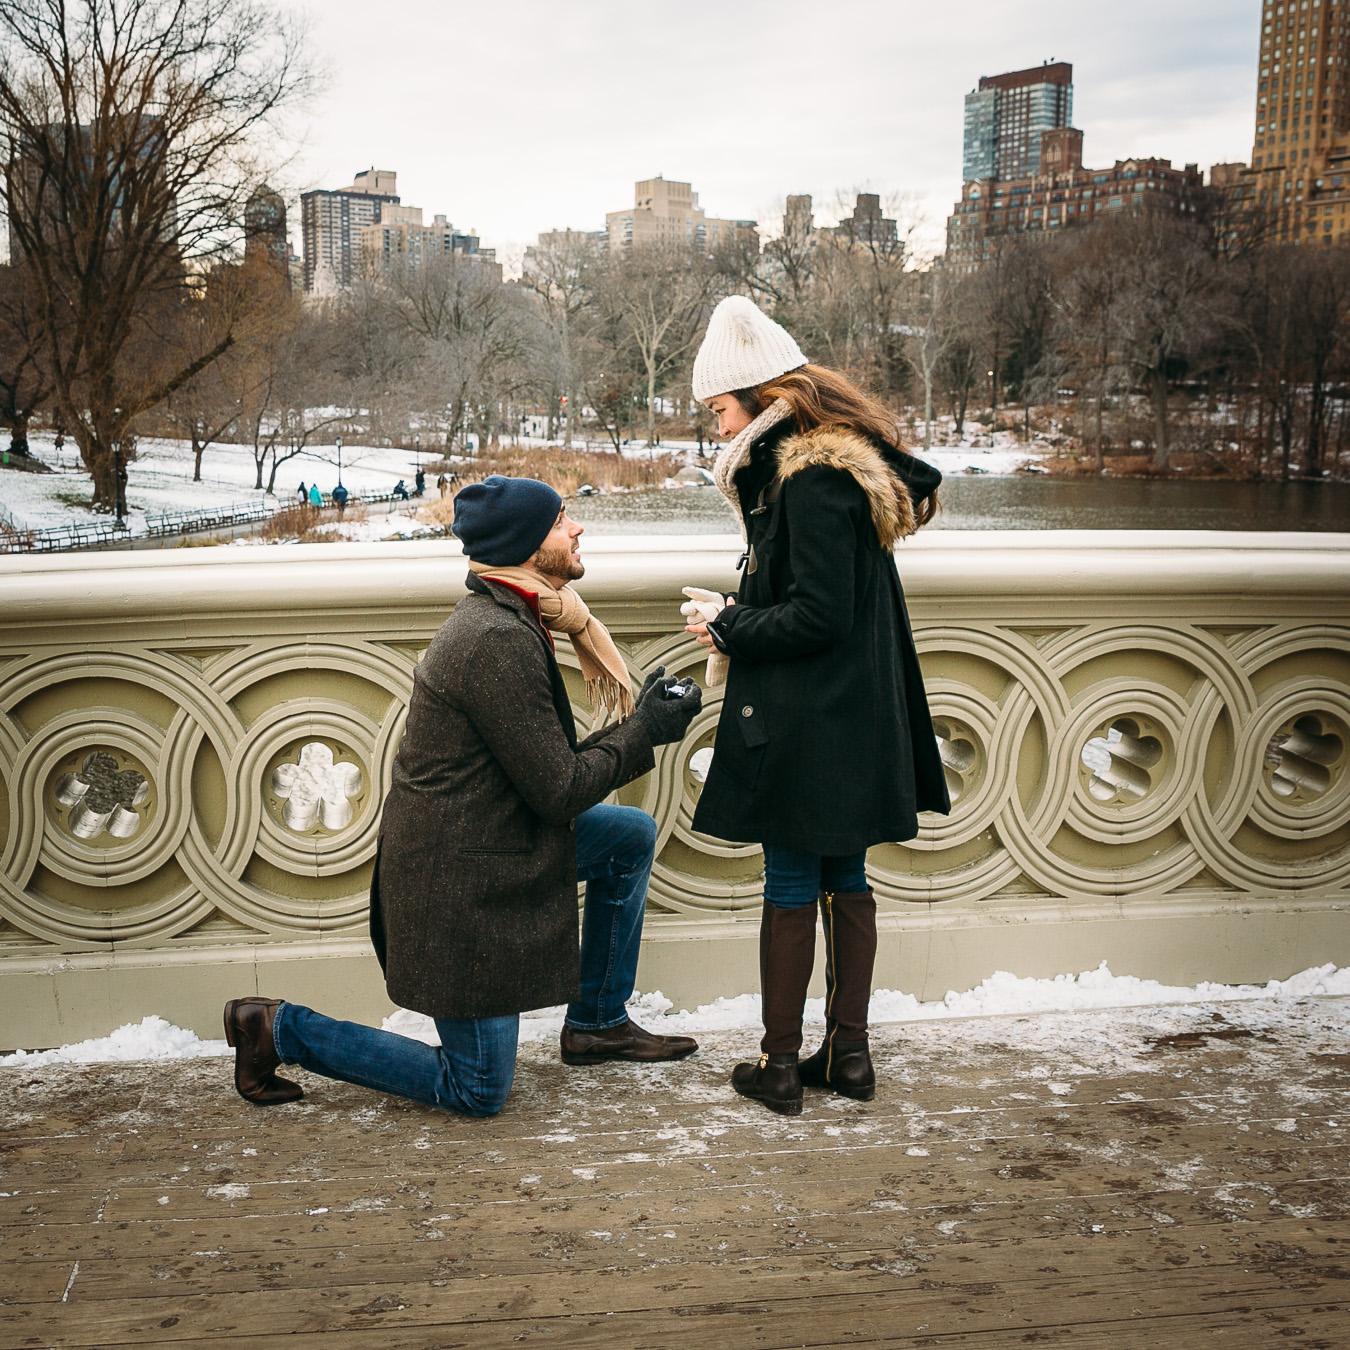 Surprise proposal at Bow Bridge in Central Park